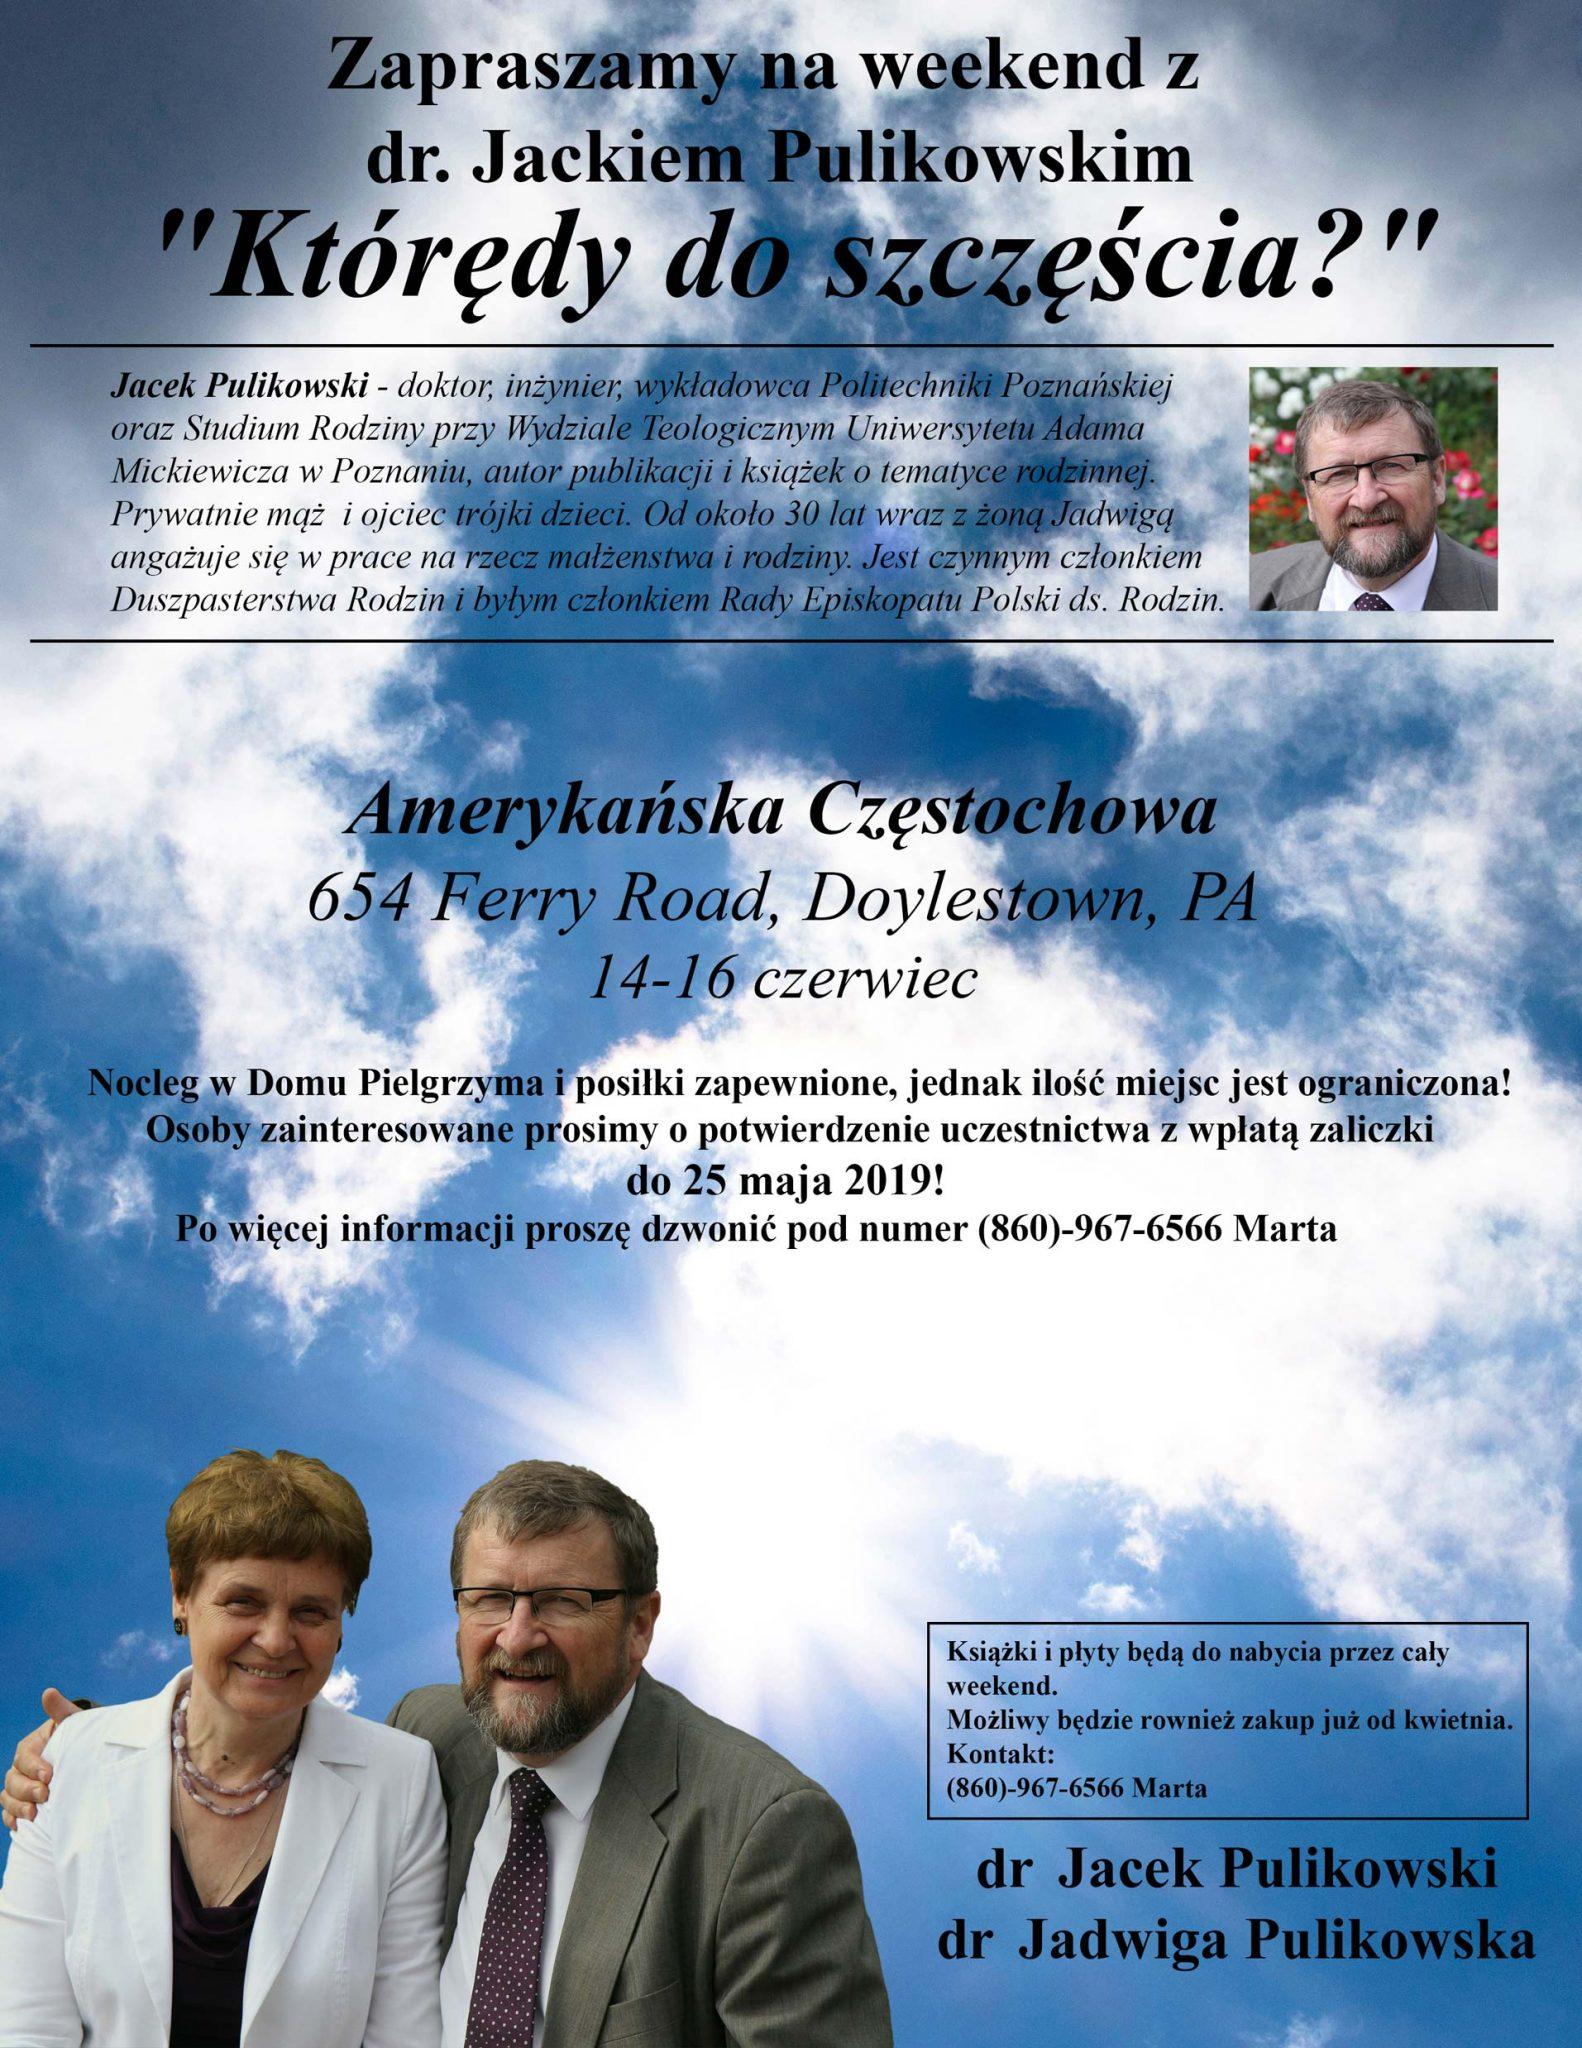 Weekend Retreat with Dr. Jacek Pulikowski (in Polish)